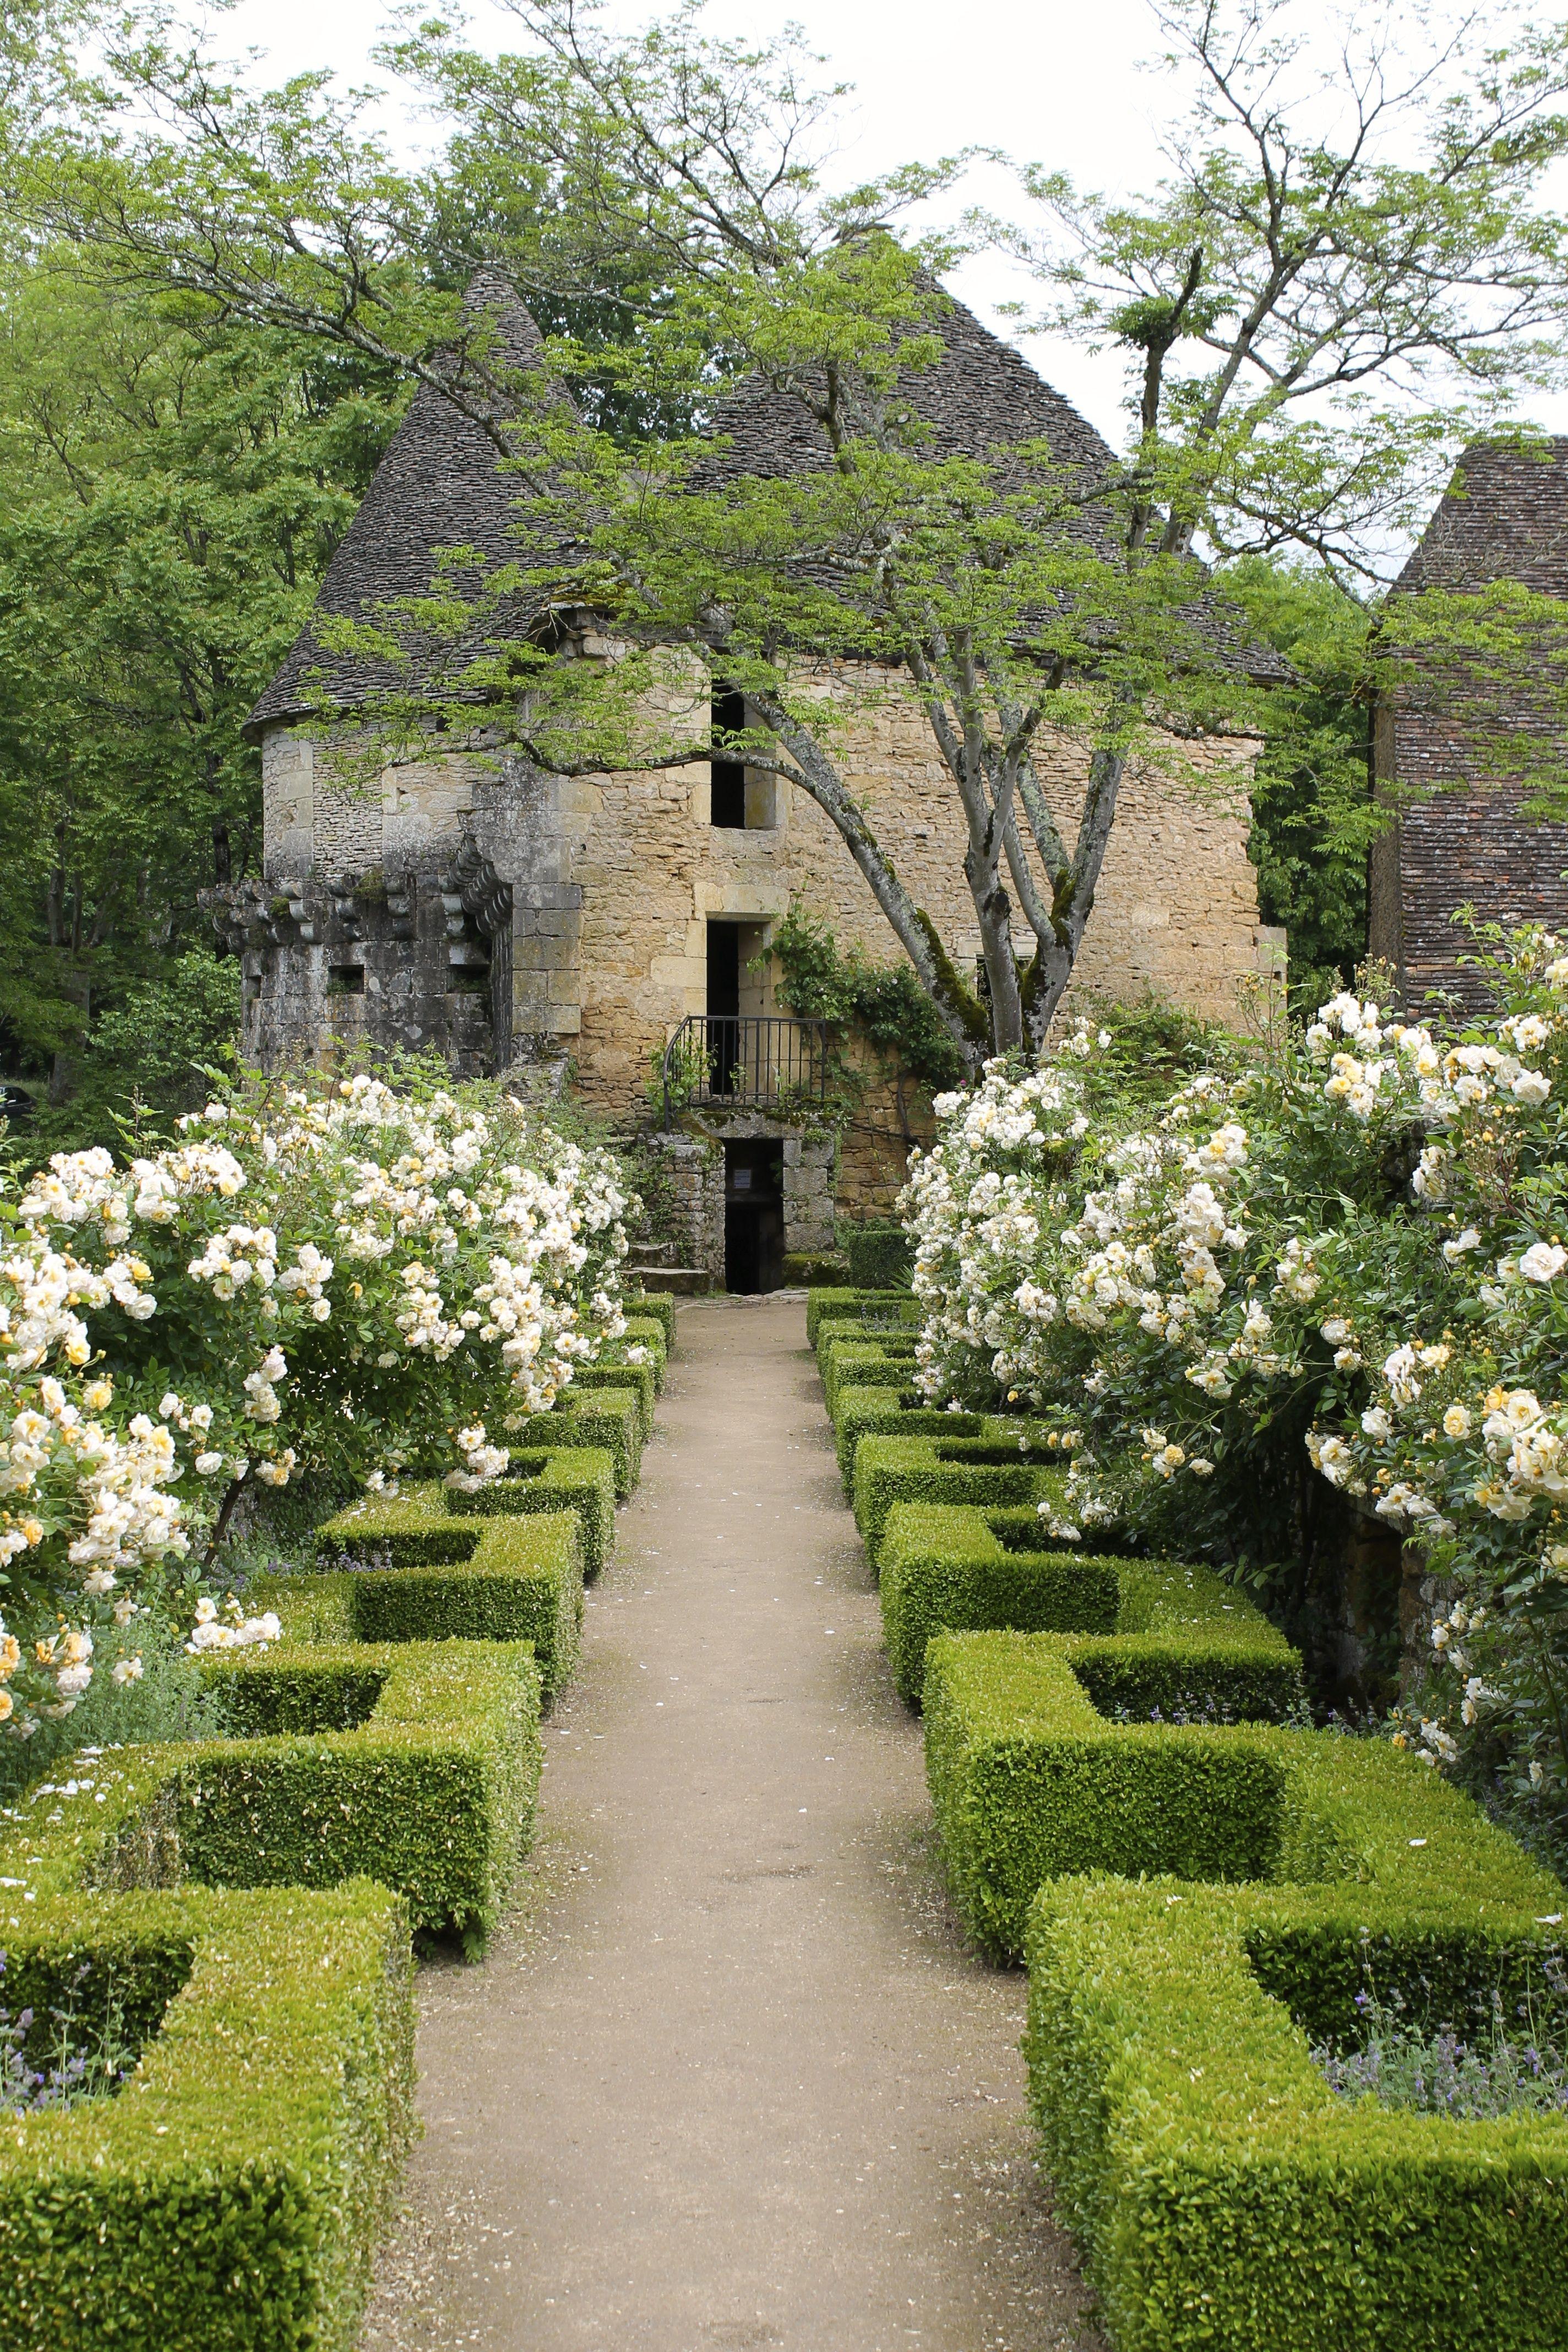 Chateau De Losse Drodogne Region France How Delightful Is The Box Hedging Along The Path It S Like Horizo Beautiful Gardens Formal Gardens Landscape Design